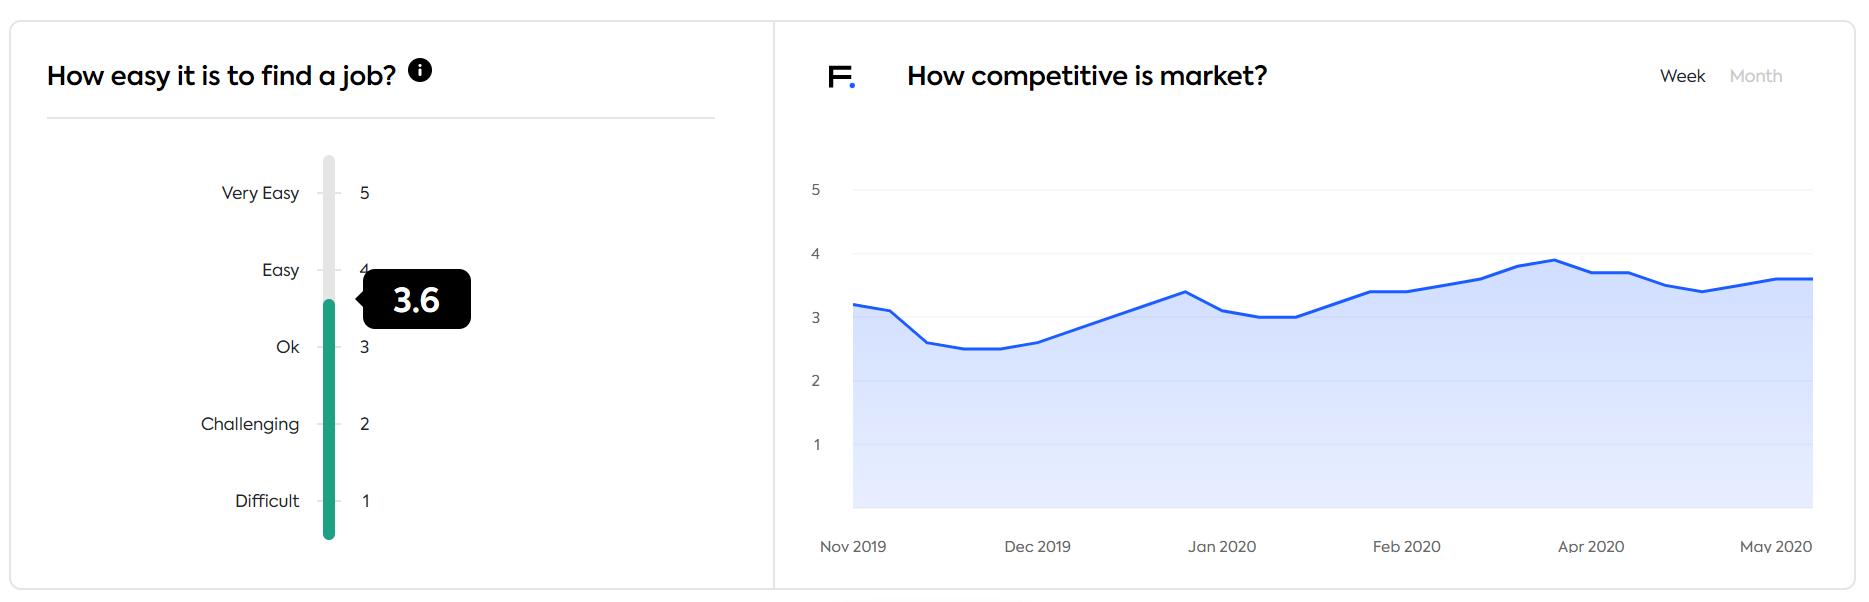 Lithuanian market competitiveness